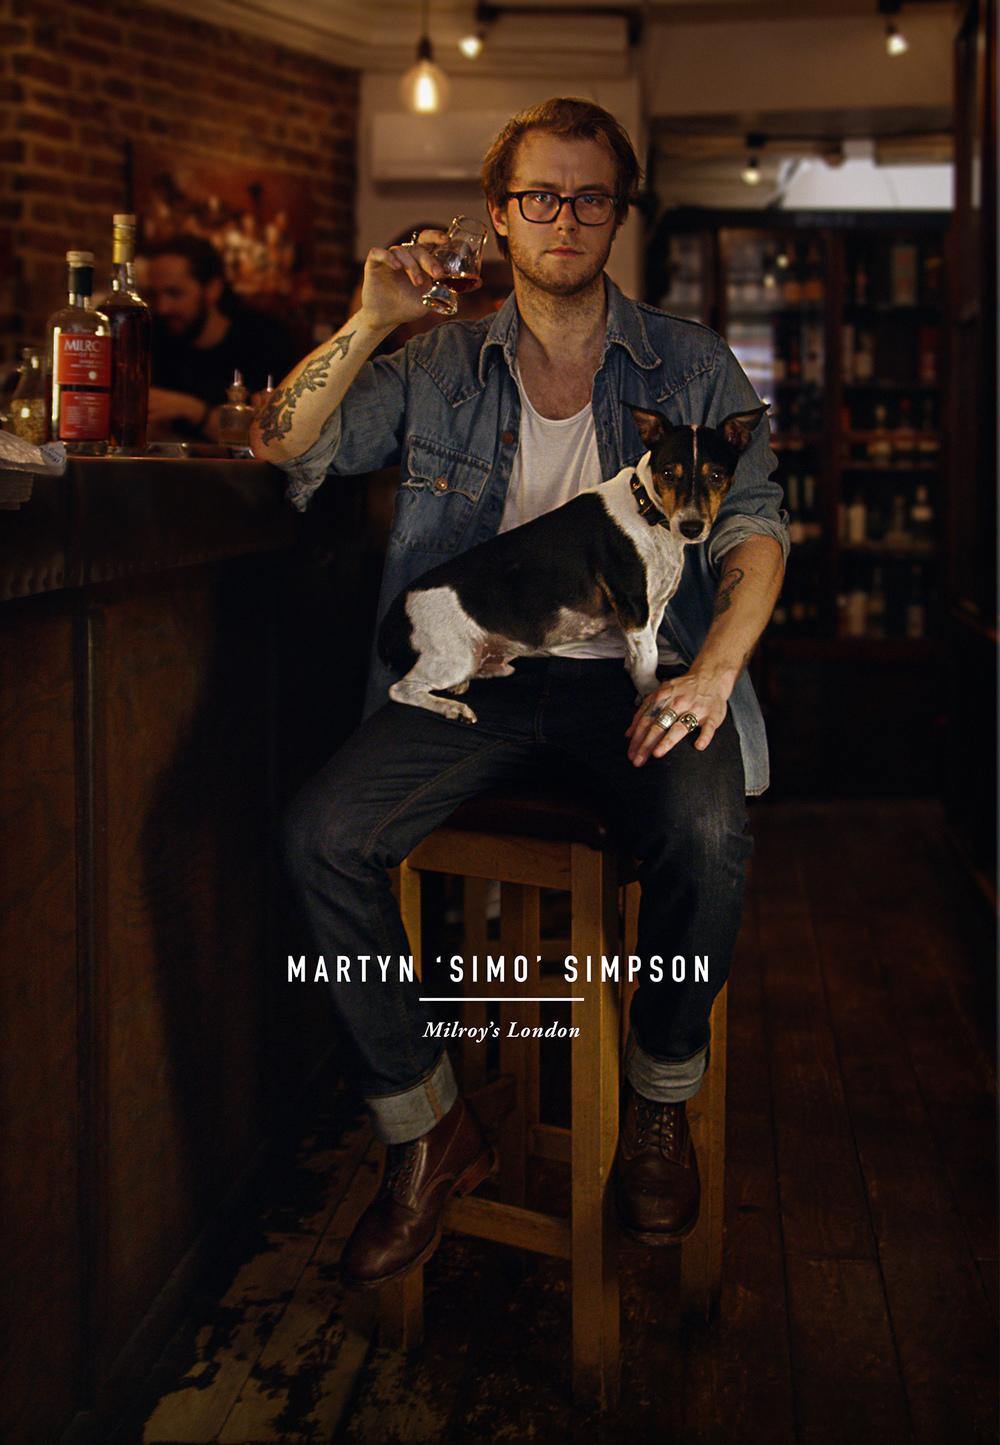 Martyn Simo Simpson